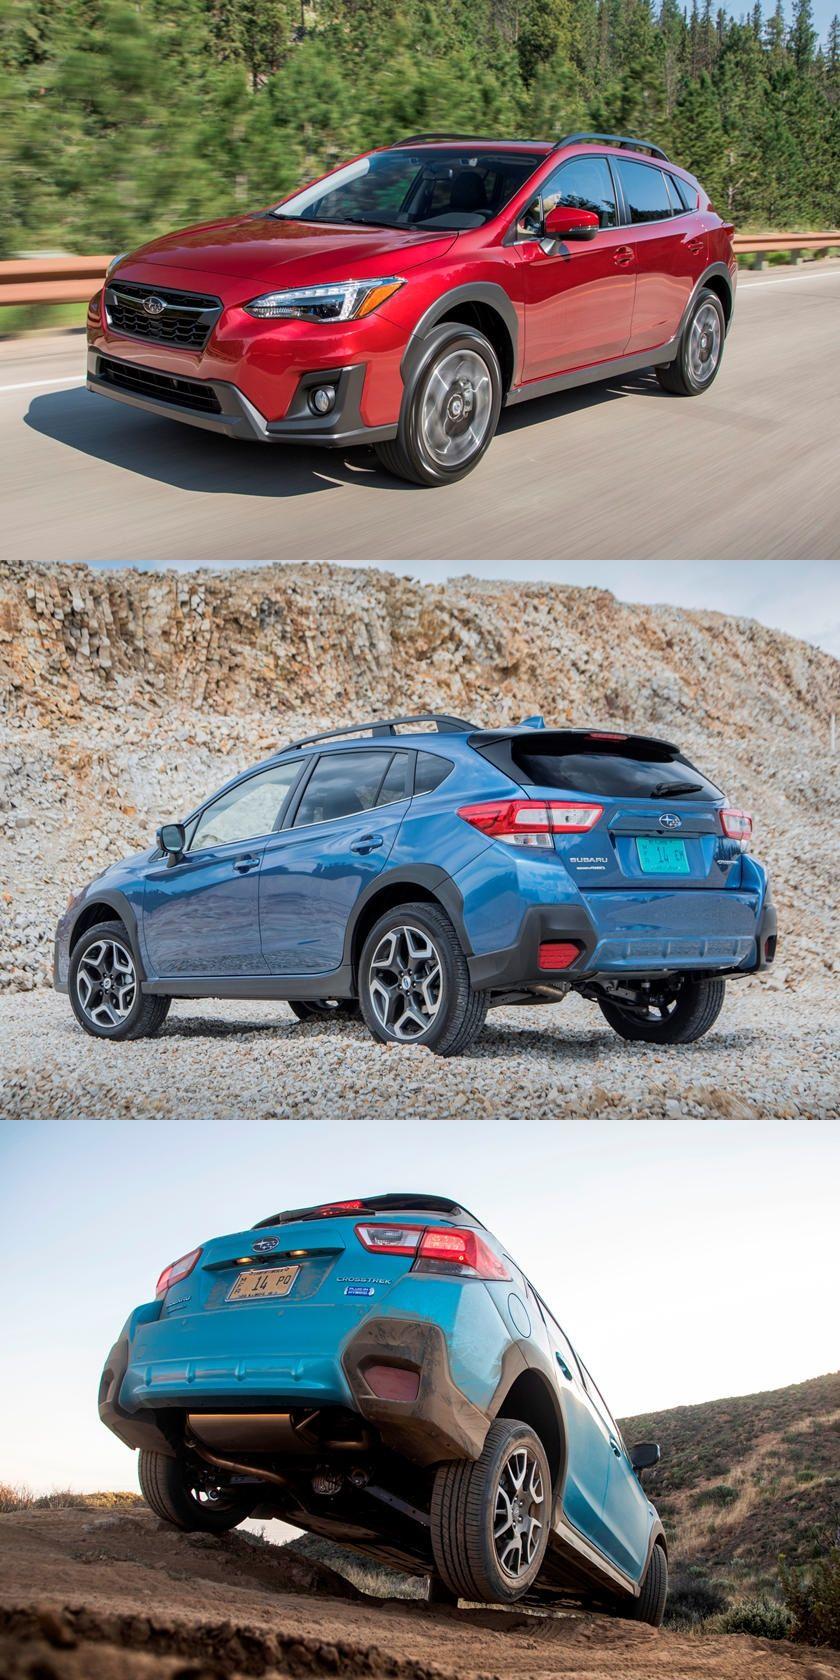 Subaru Crosstrek Finally Getting The Engine It Deserves According To Subaru S Ceo In 2020 Subaru Crosstrek Subaru Subaru Outback